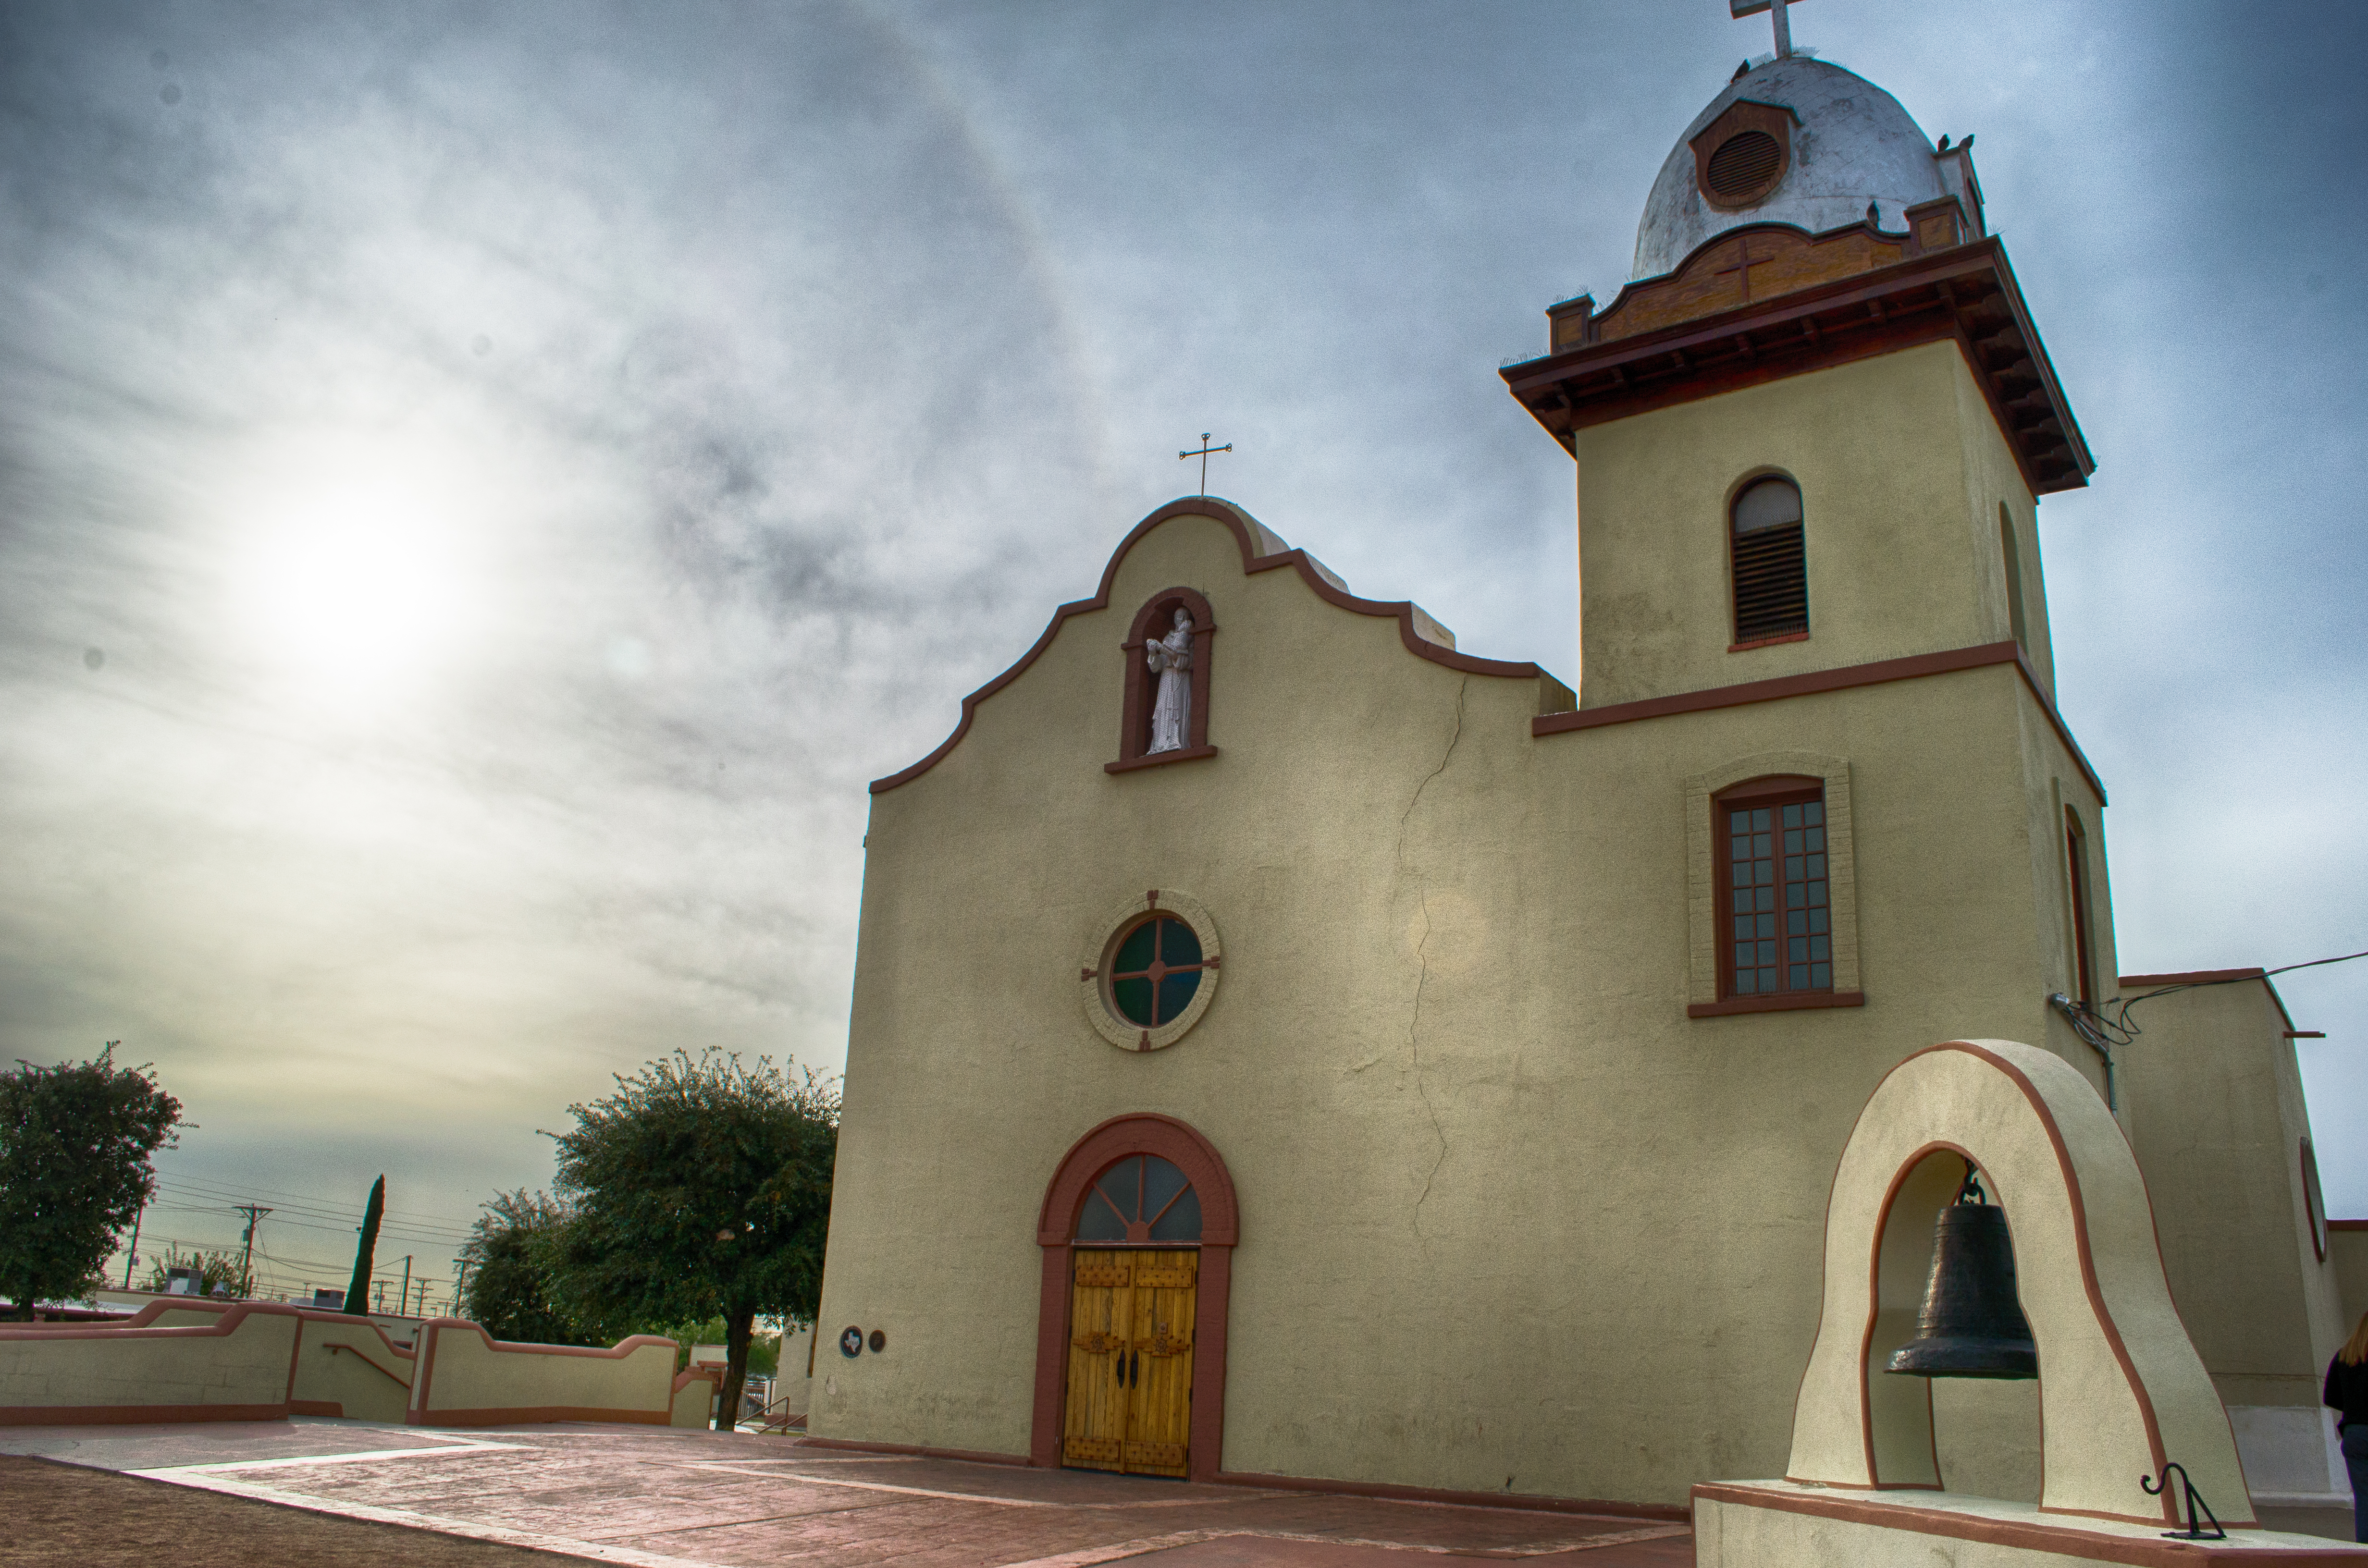 Exploring The El Paso Mission Trail